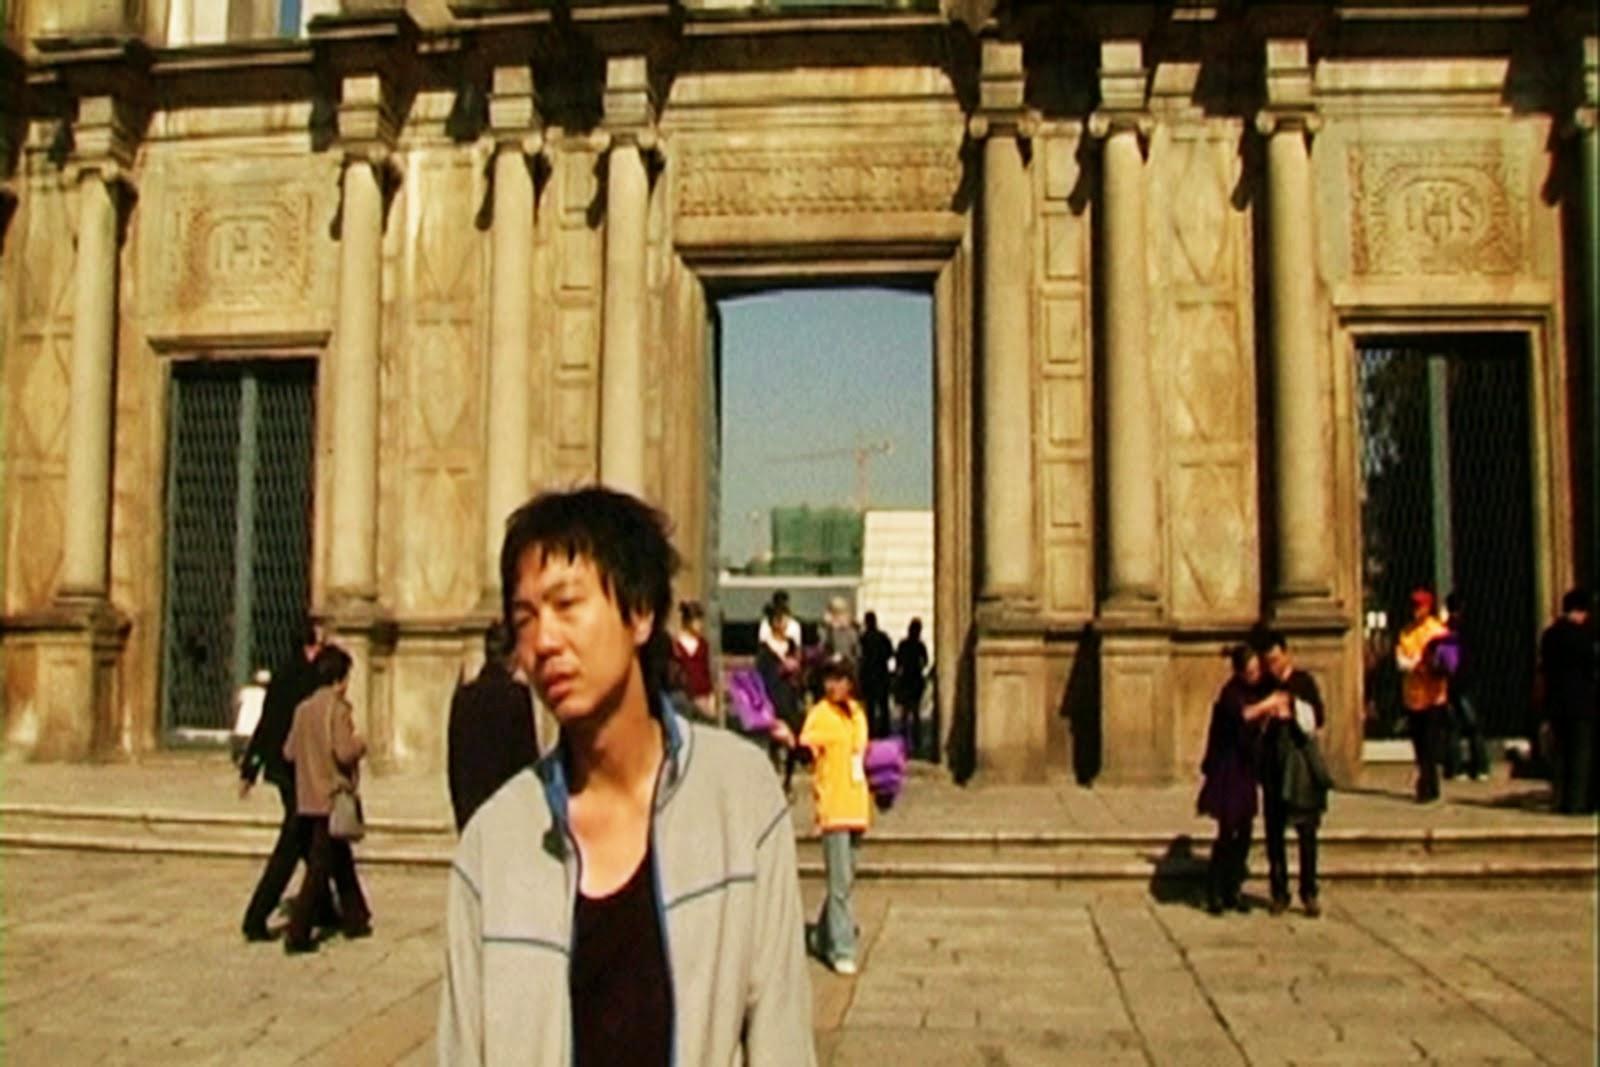 ROULETTE CITY stills